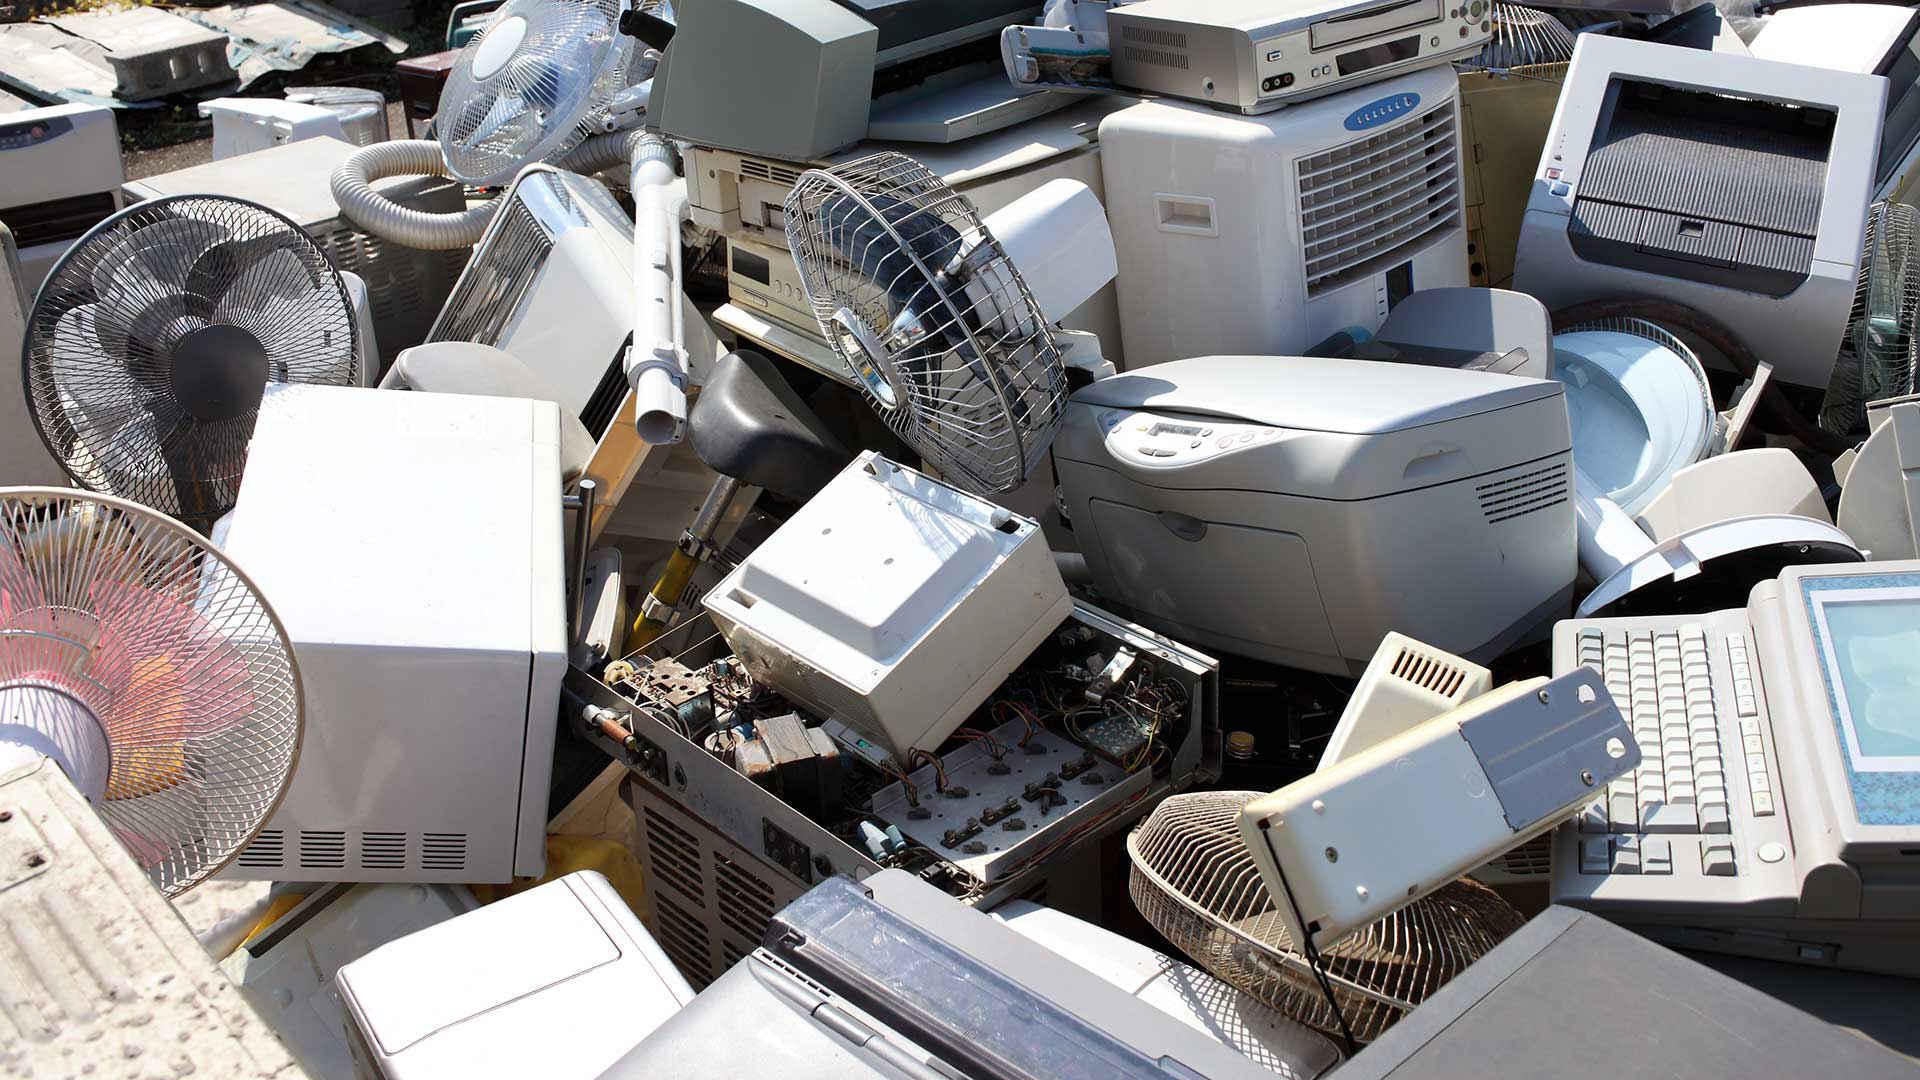 Elektroschrott: Berg von Altgeräten